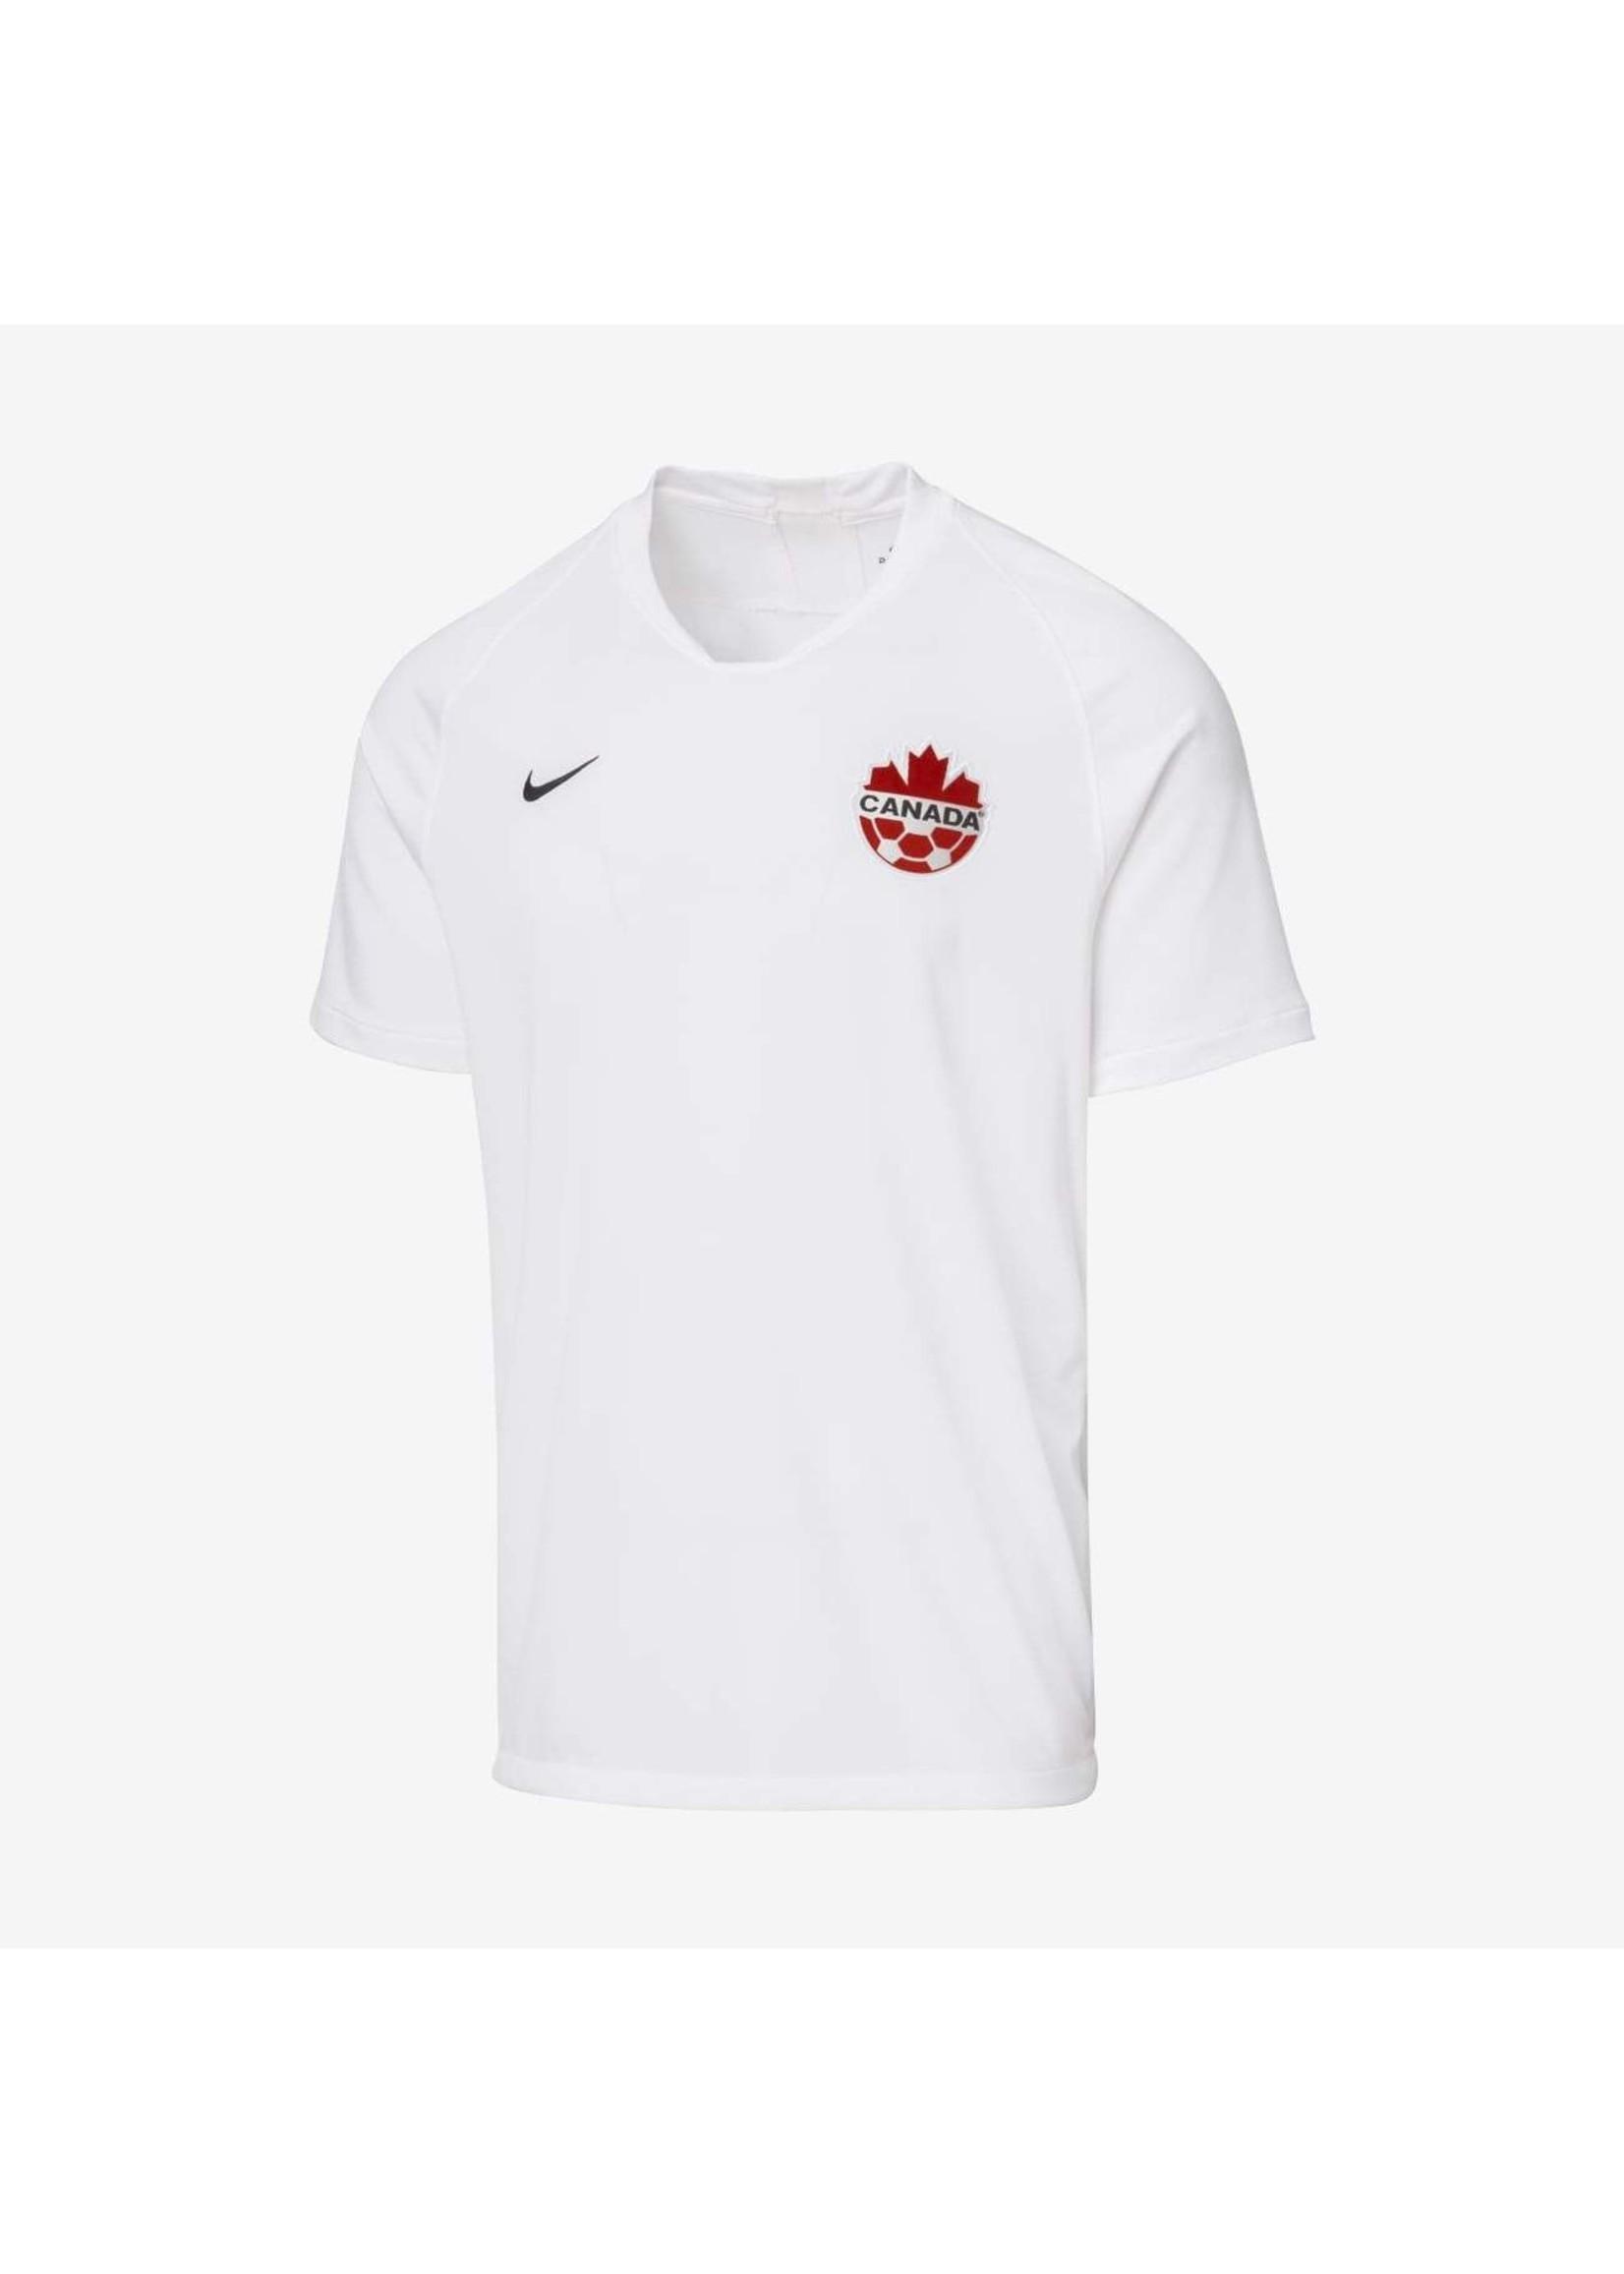 Nike Canada 19/20 Away Jersey Youth